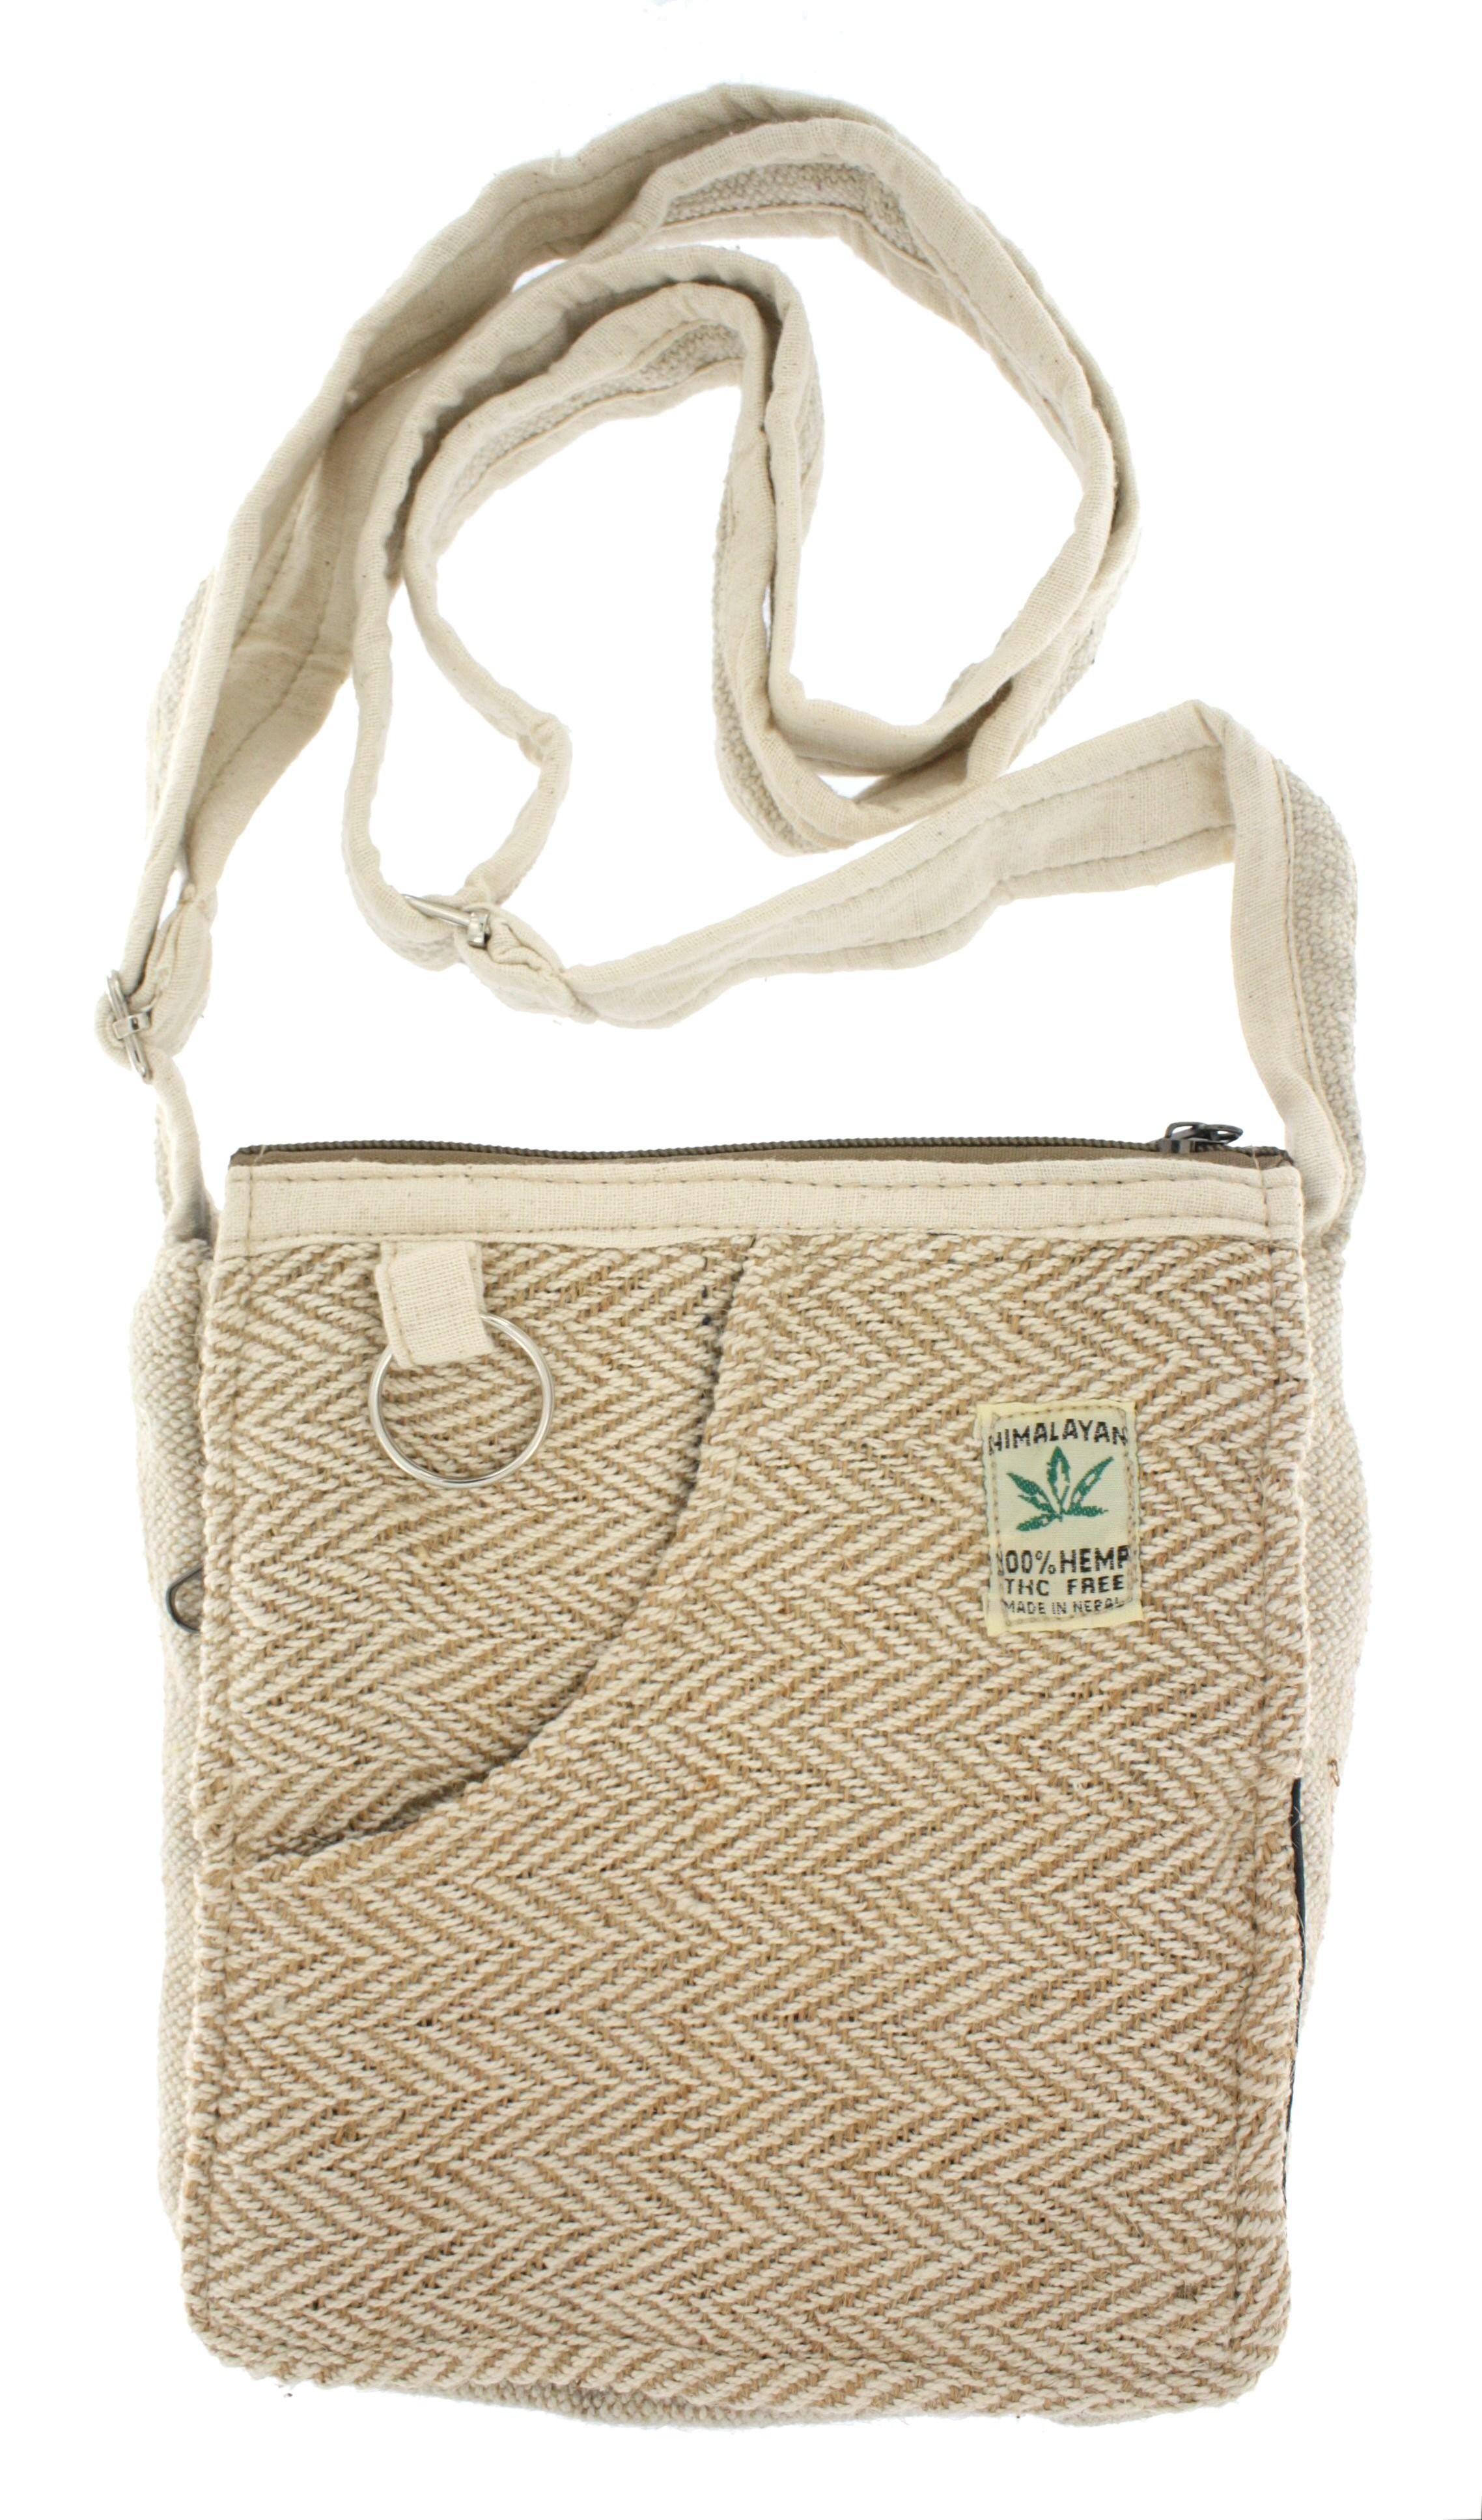 SMALL SHOLDER BAGS CNP-BSP14 - Oriente Import S.r.l.